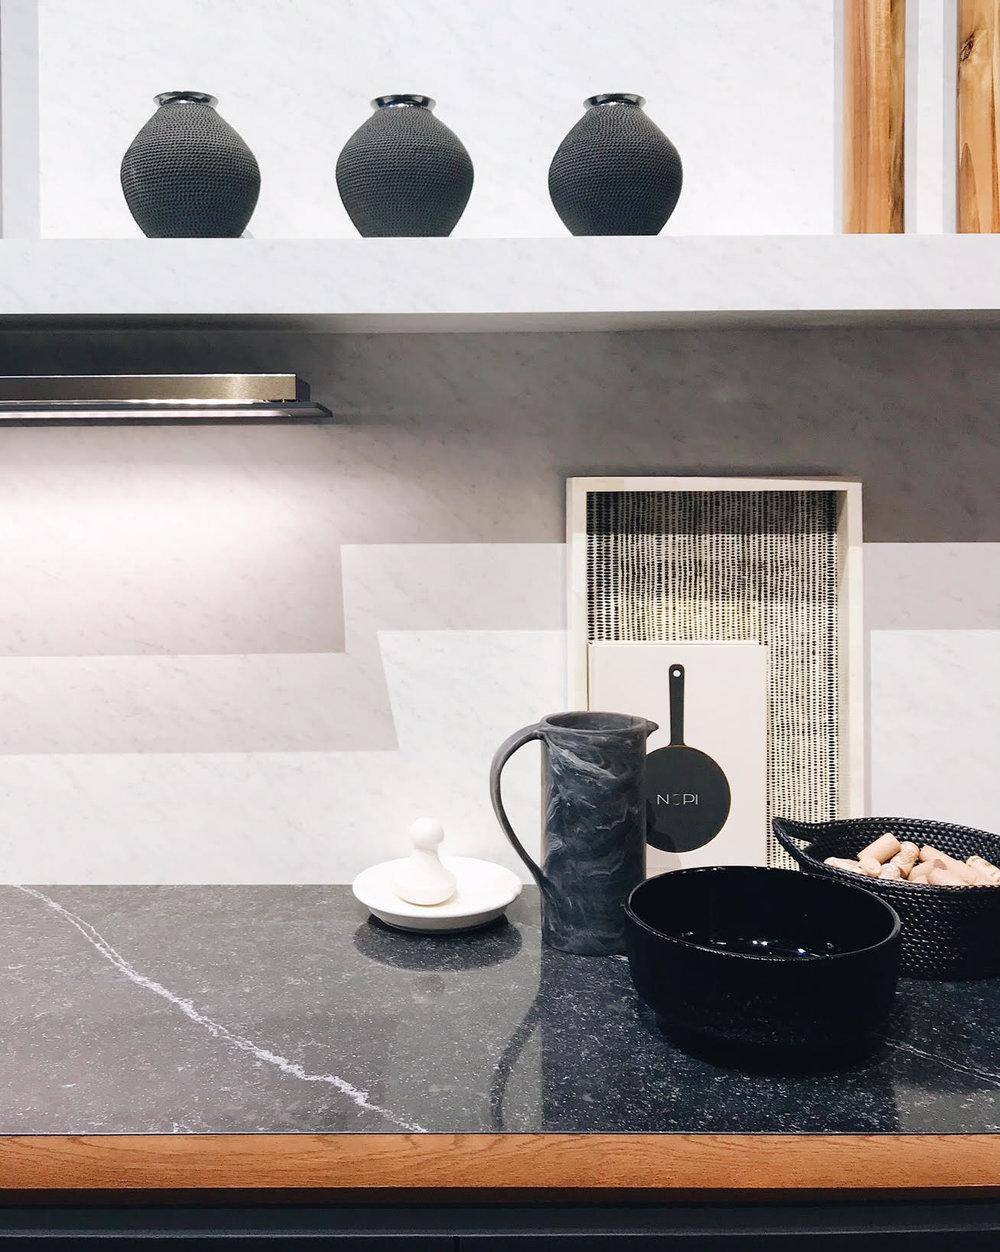 Wilsonart, Open Shelves, Kitchen Trends, BlogTourKBIS, Modenus, KBIS 2018, Nyla Free Designs, Calgary Interior Designer